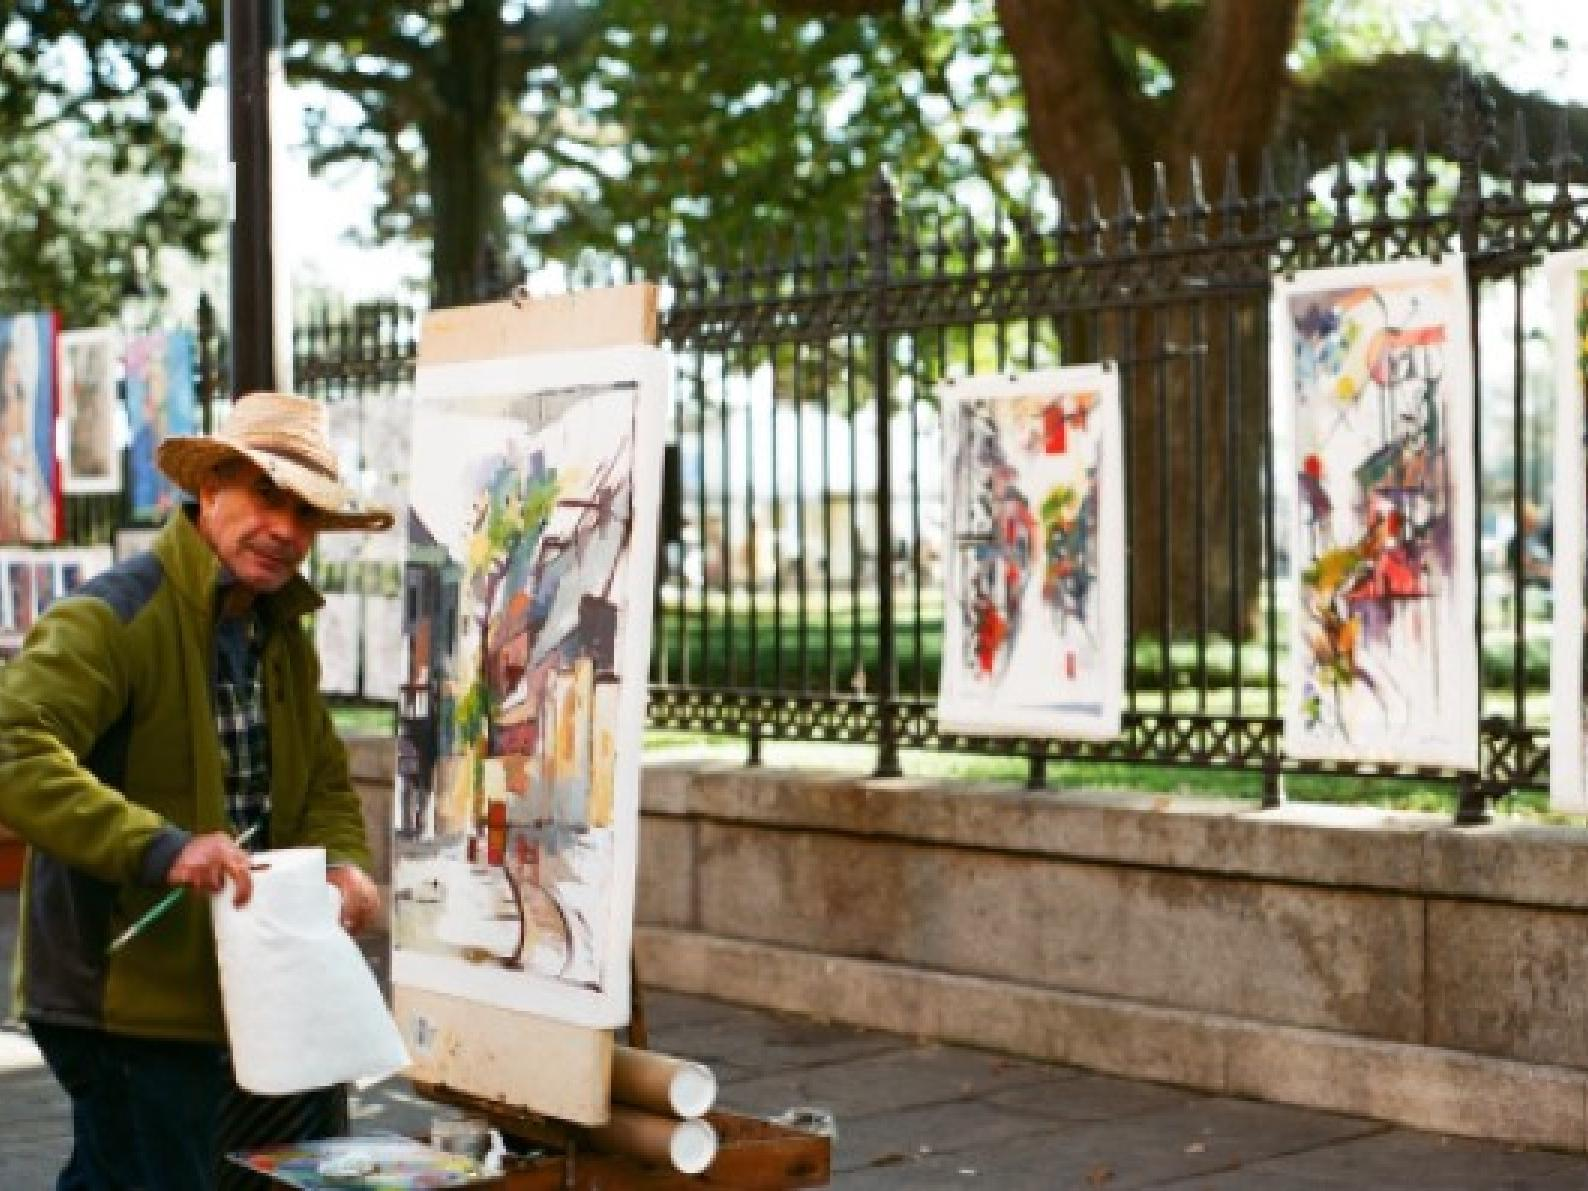 A street painter near the hotel